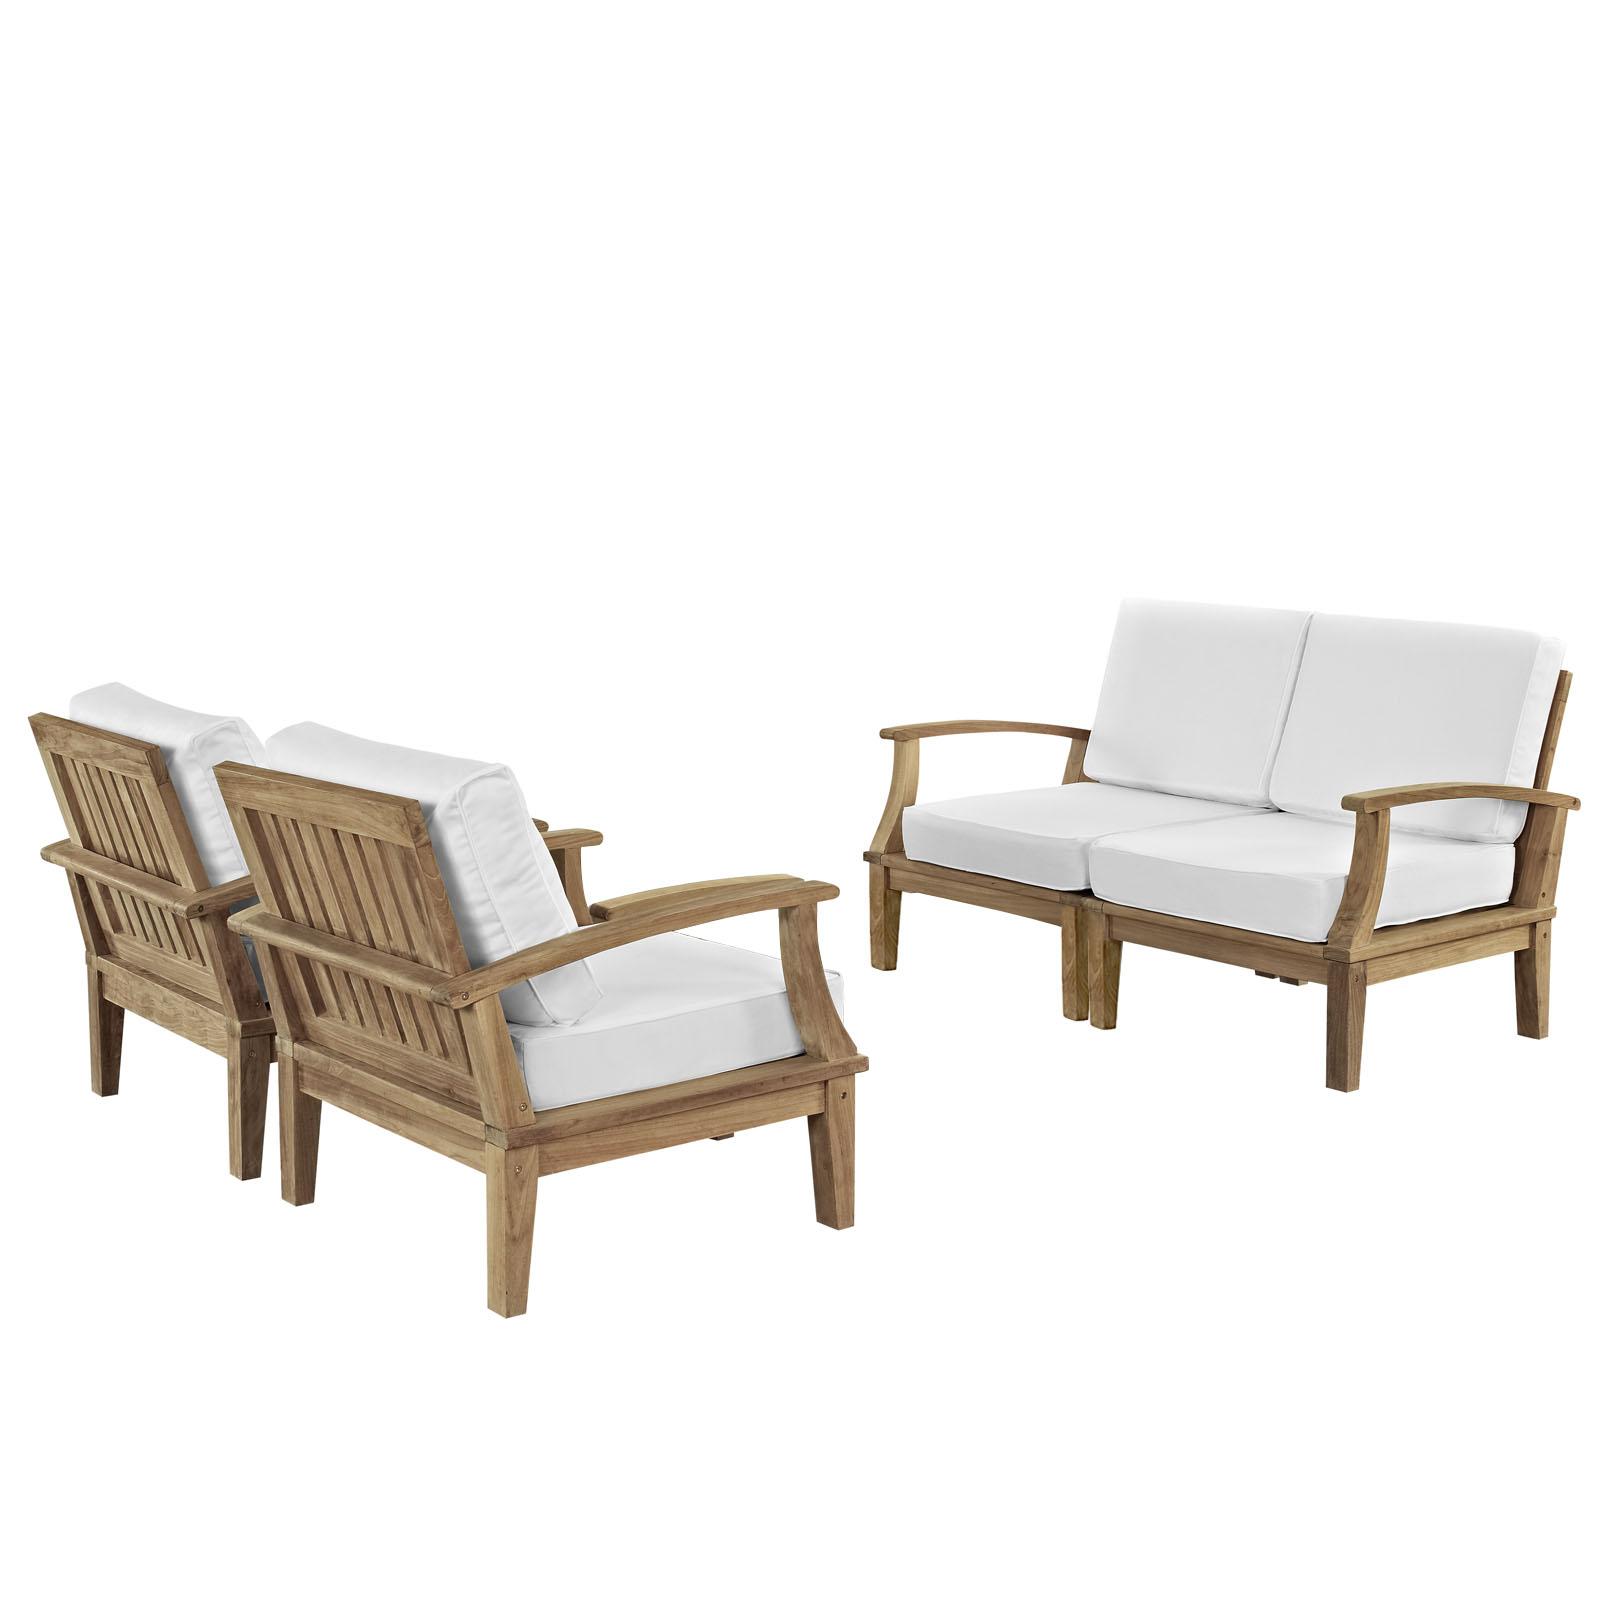 Modern Contemporary Four PCS Outdoor Patio Teak Sofa Set, White, Fabric, Wood